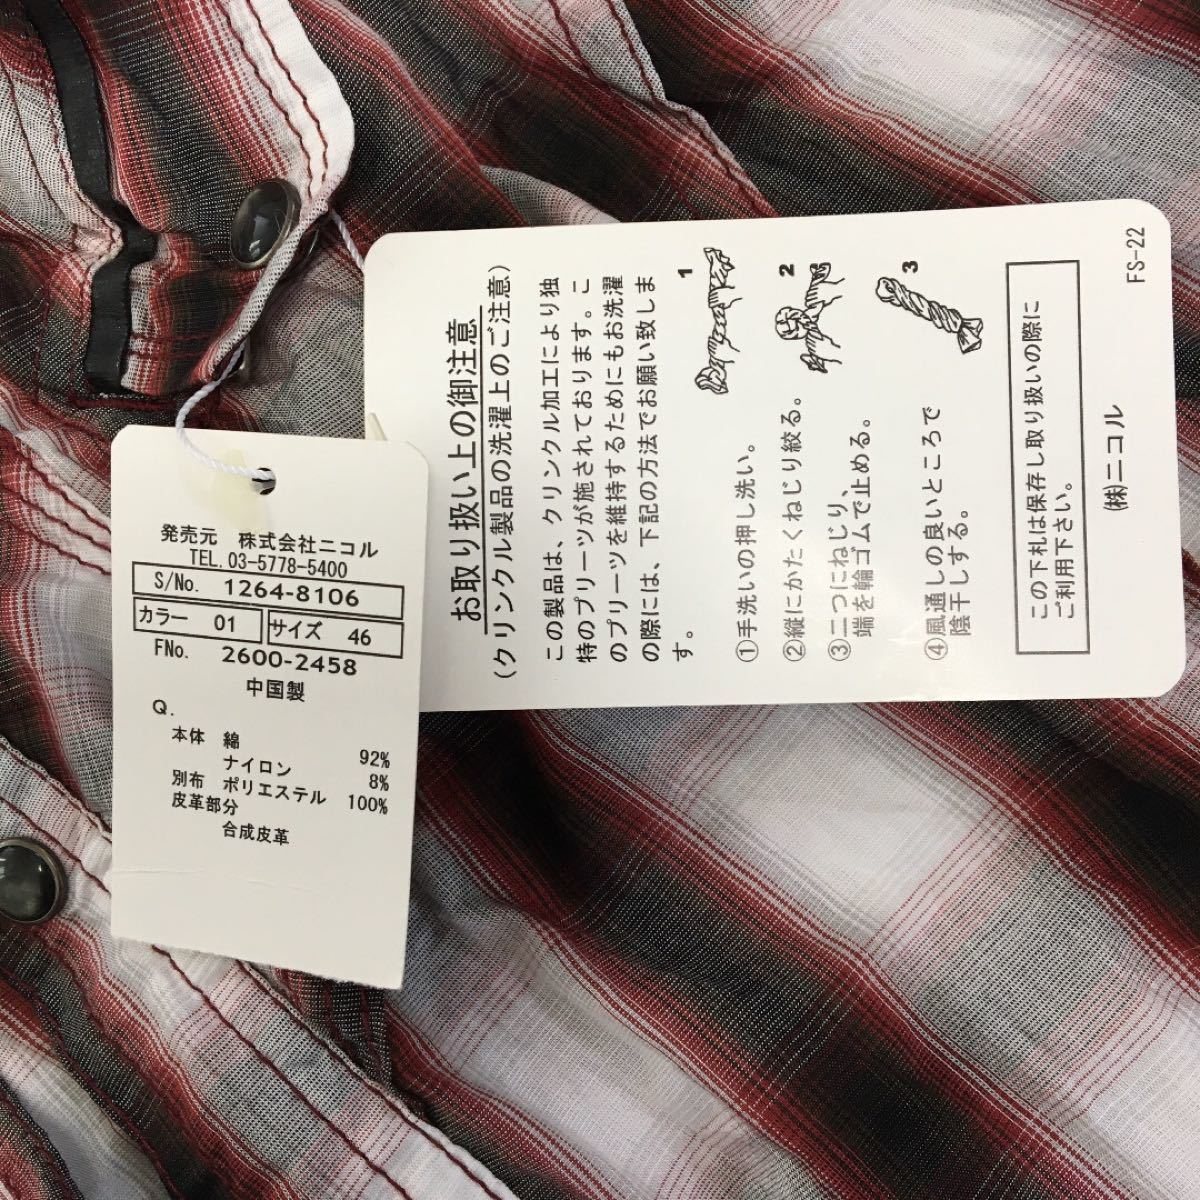 NICOLE CLUB FOR MEN チェック柄半袖シャツ